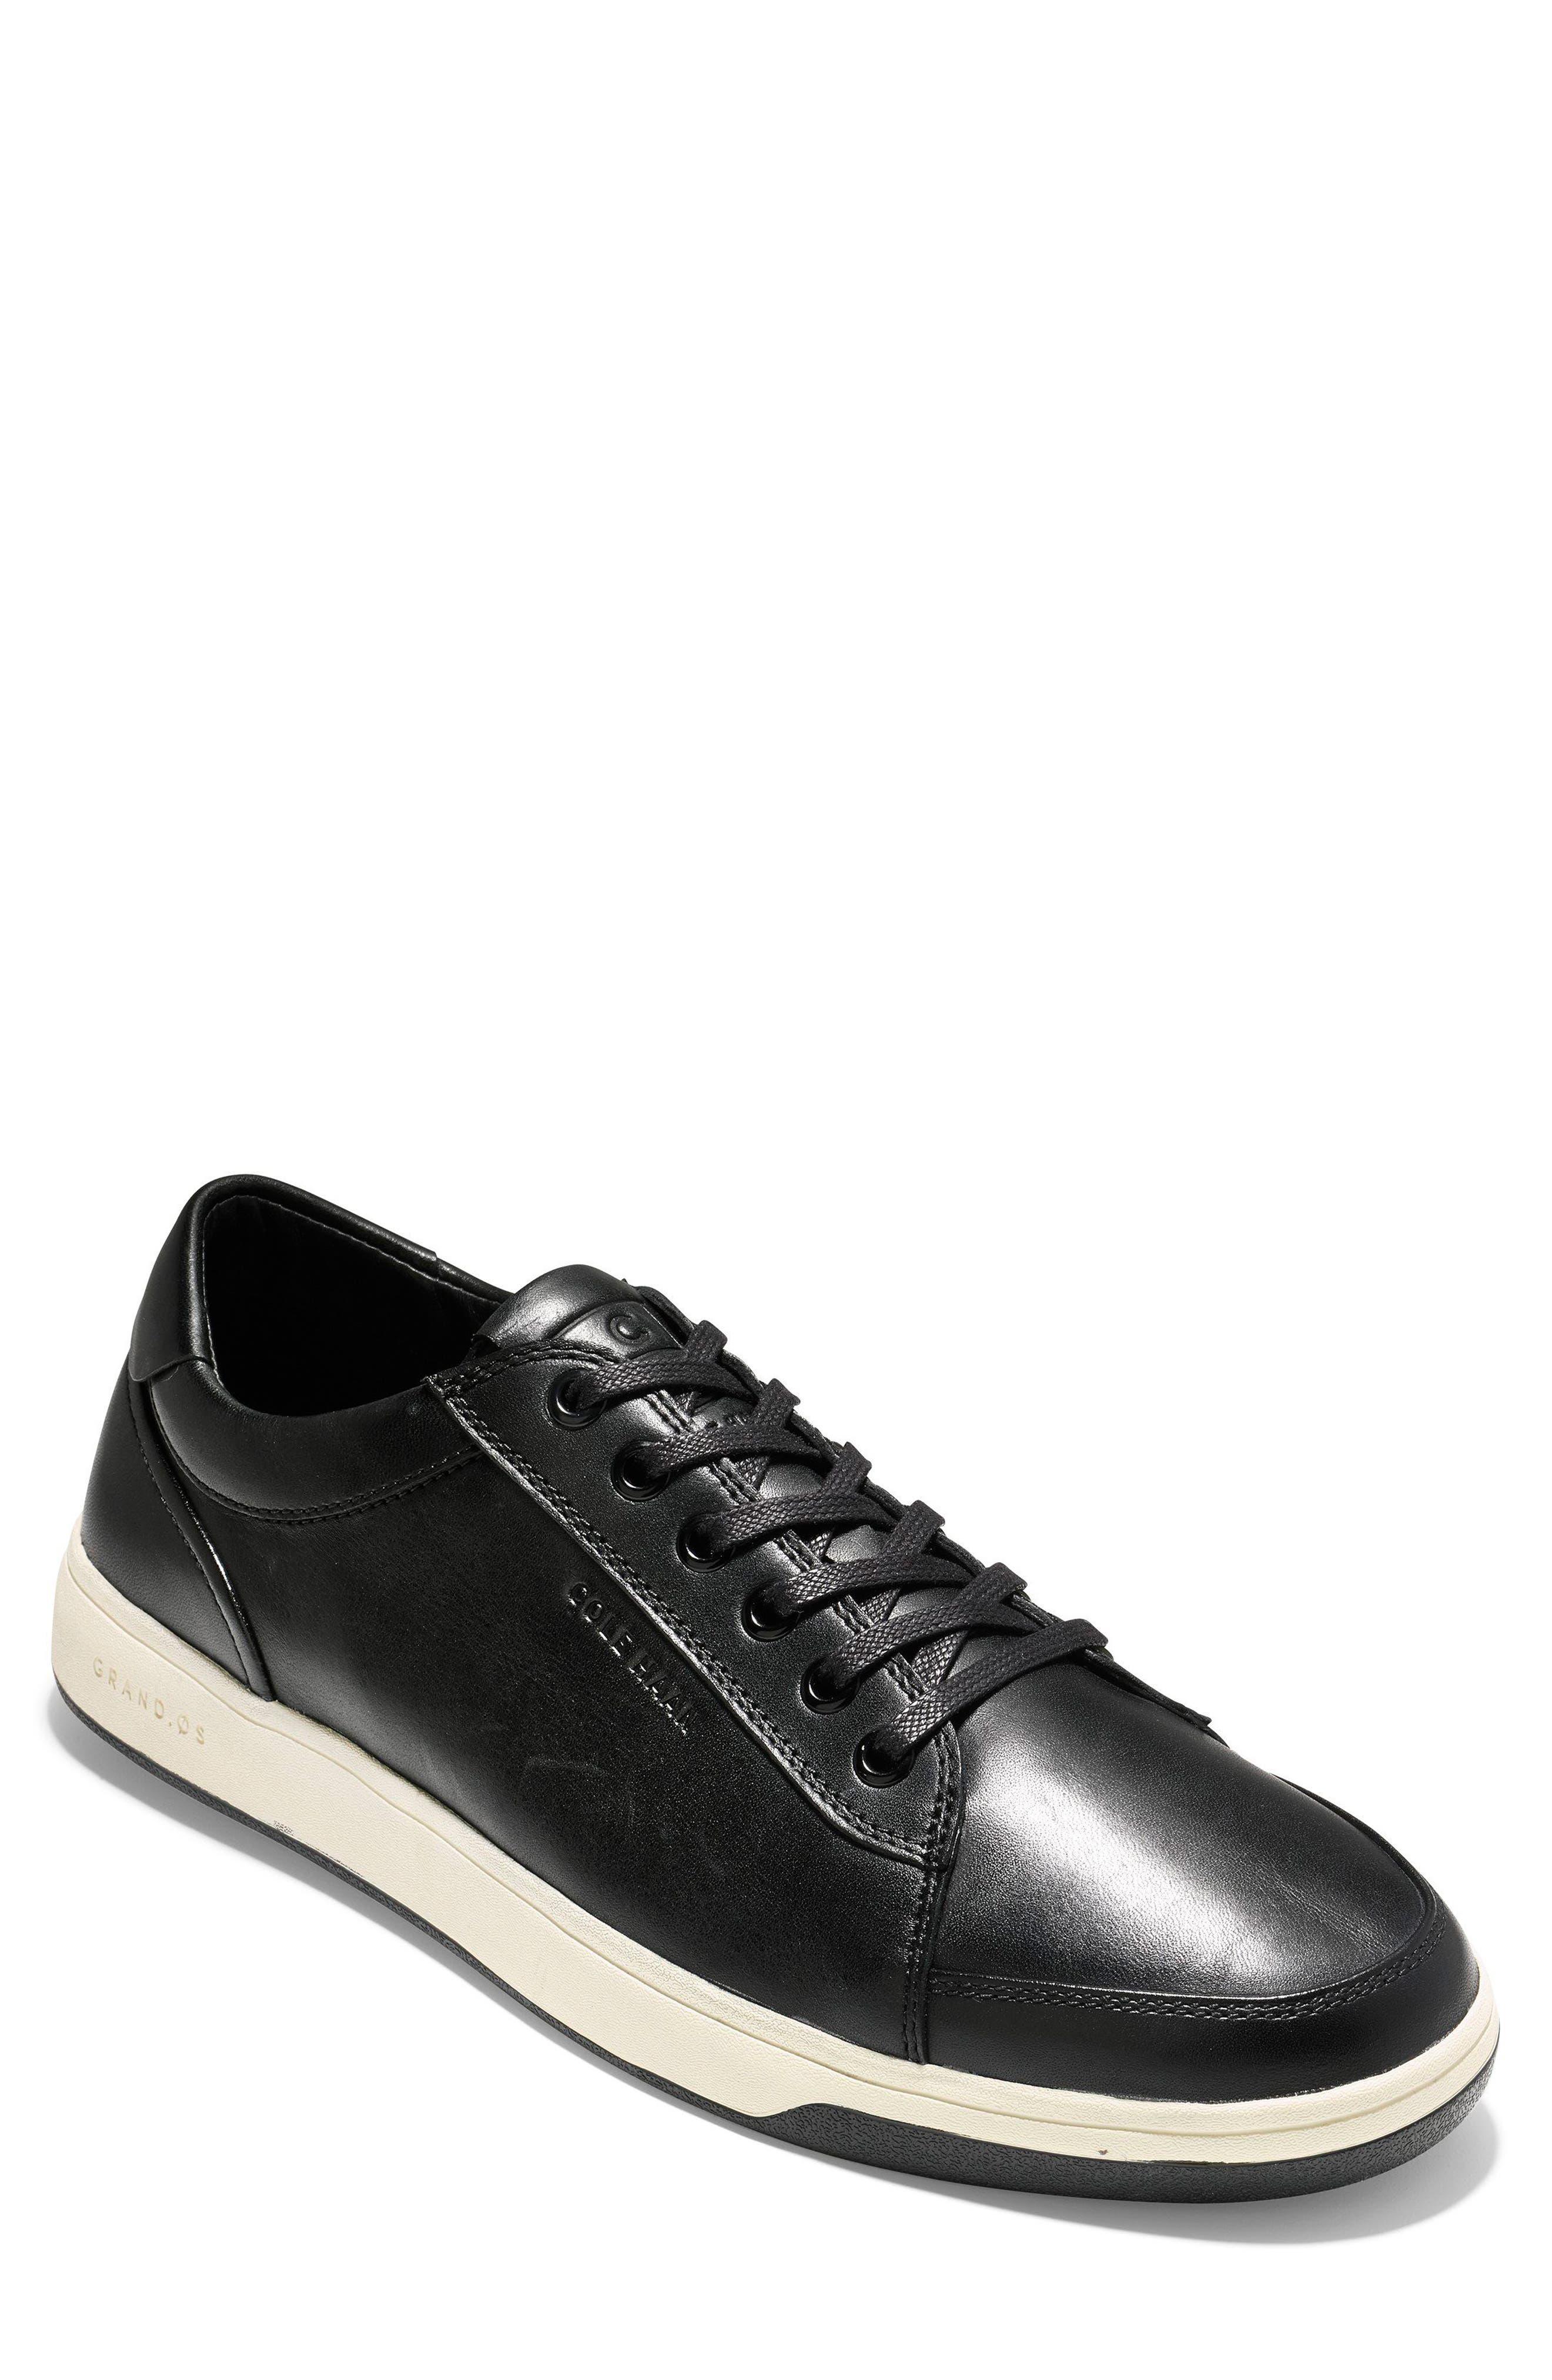 GrandPro Spectator Sneaker,                         Main,                         color, 001